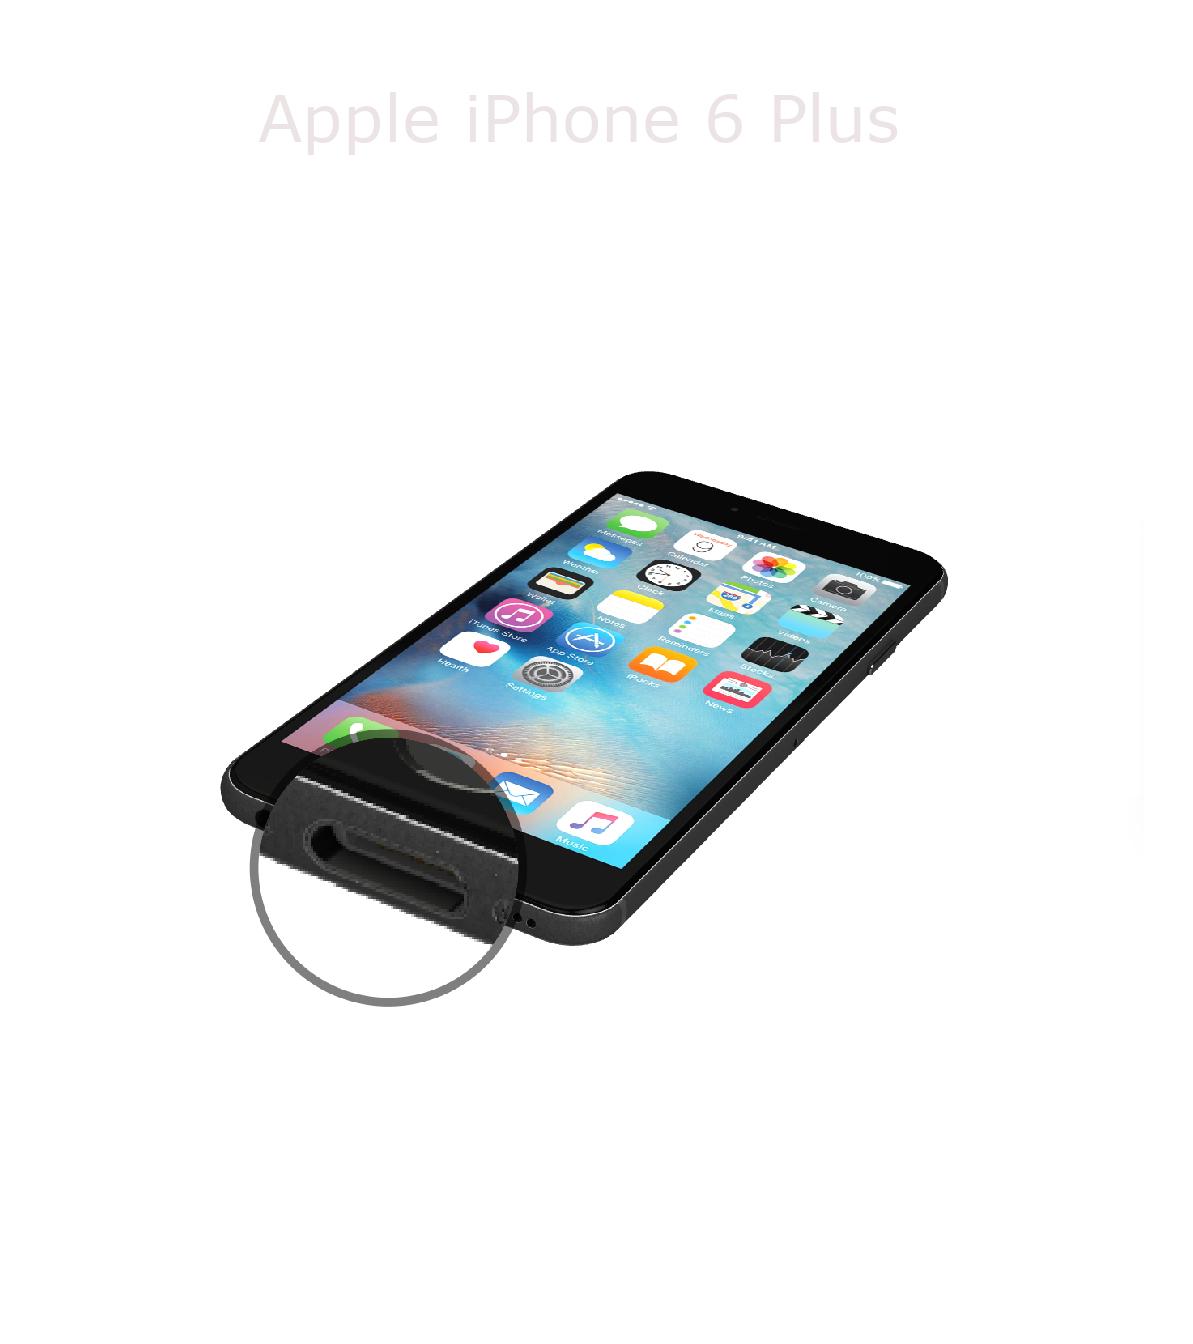 Laga laddkontakt iPhone 6 plus